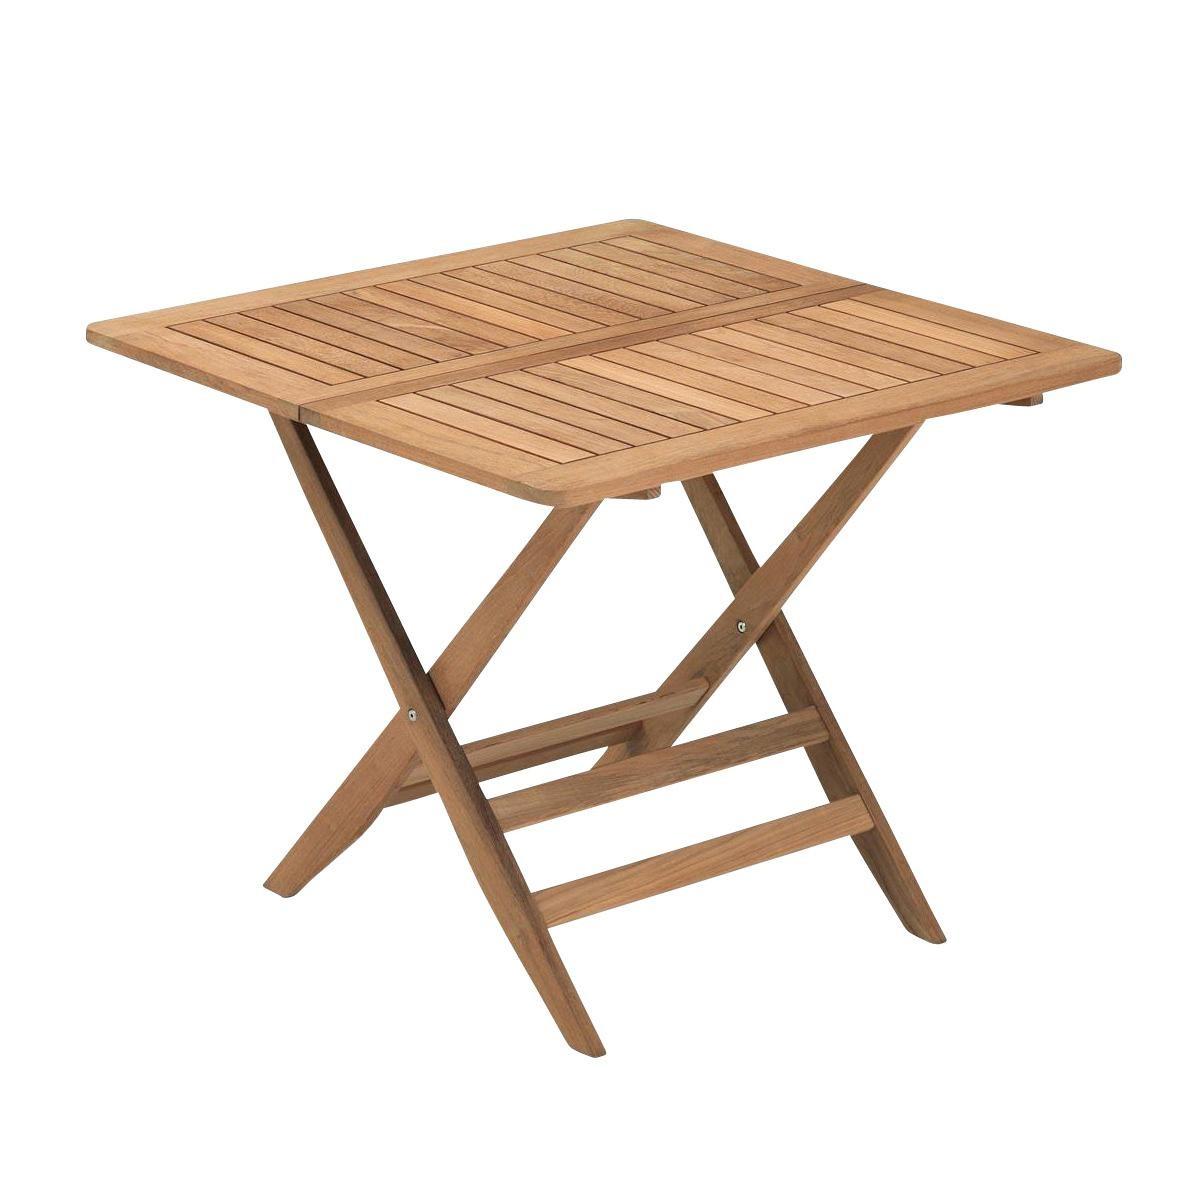 Gartentisch Sale.Nautic Folding Garden Table 85x85cm